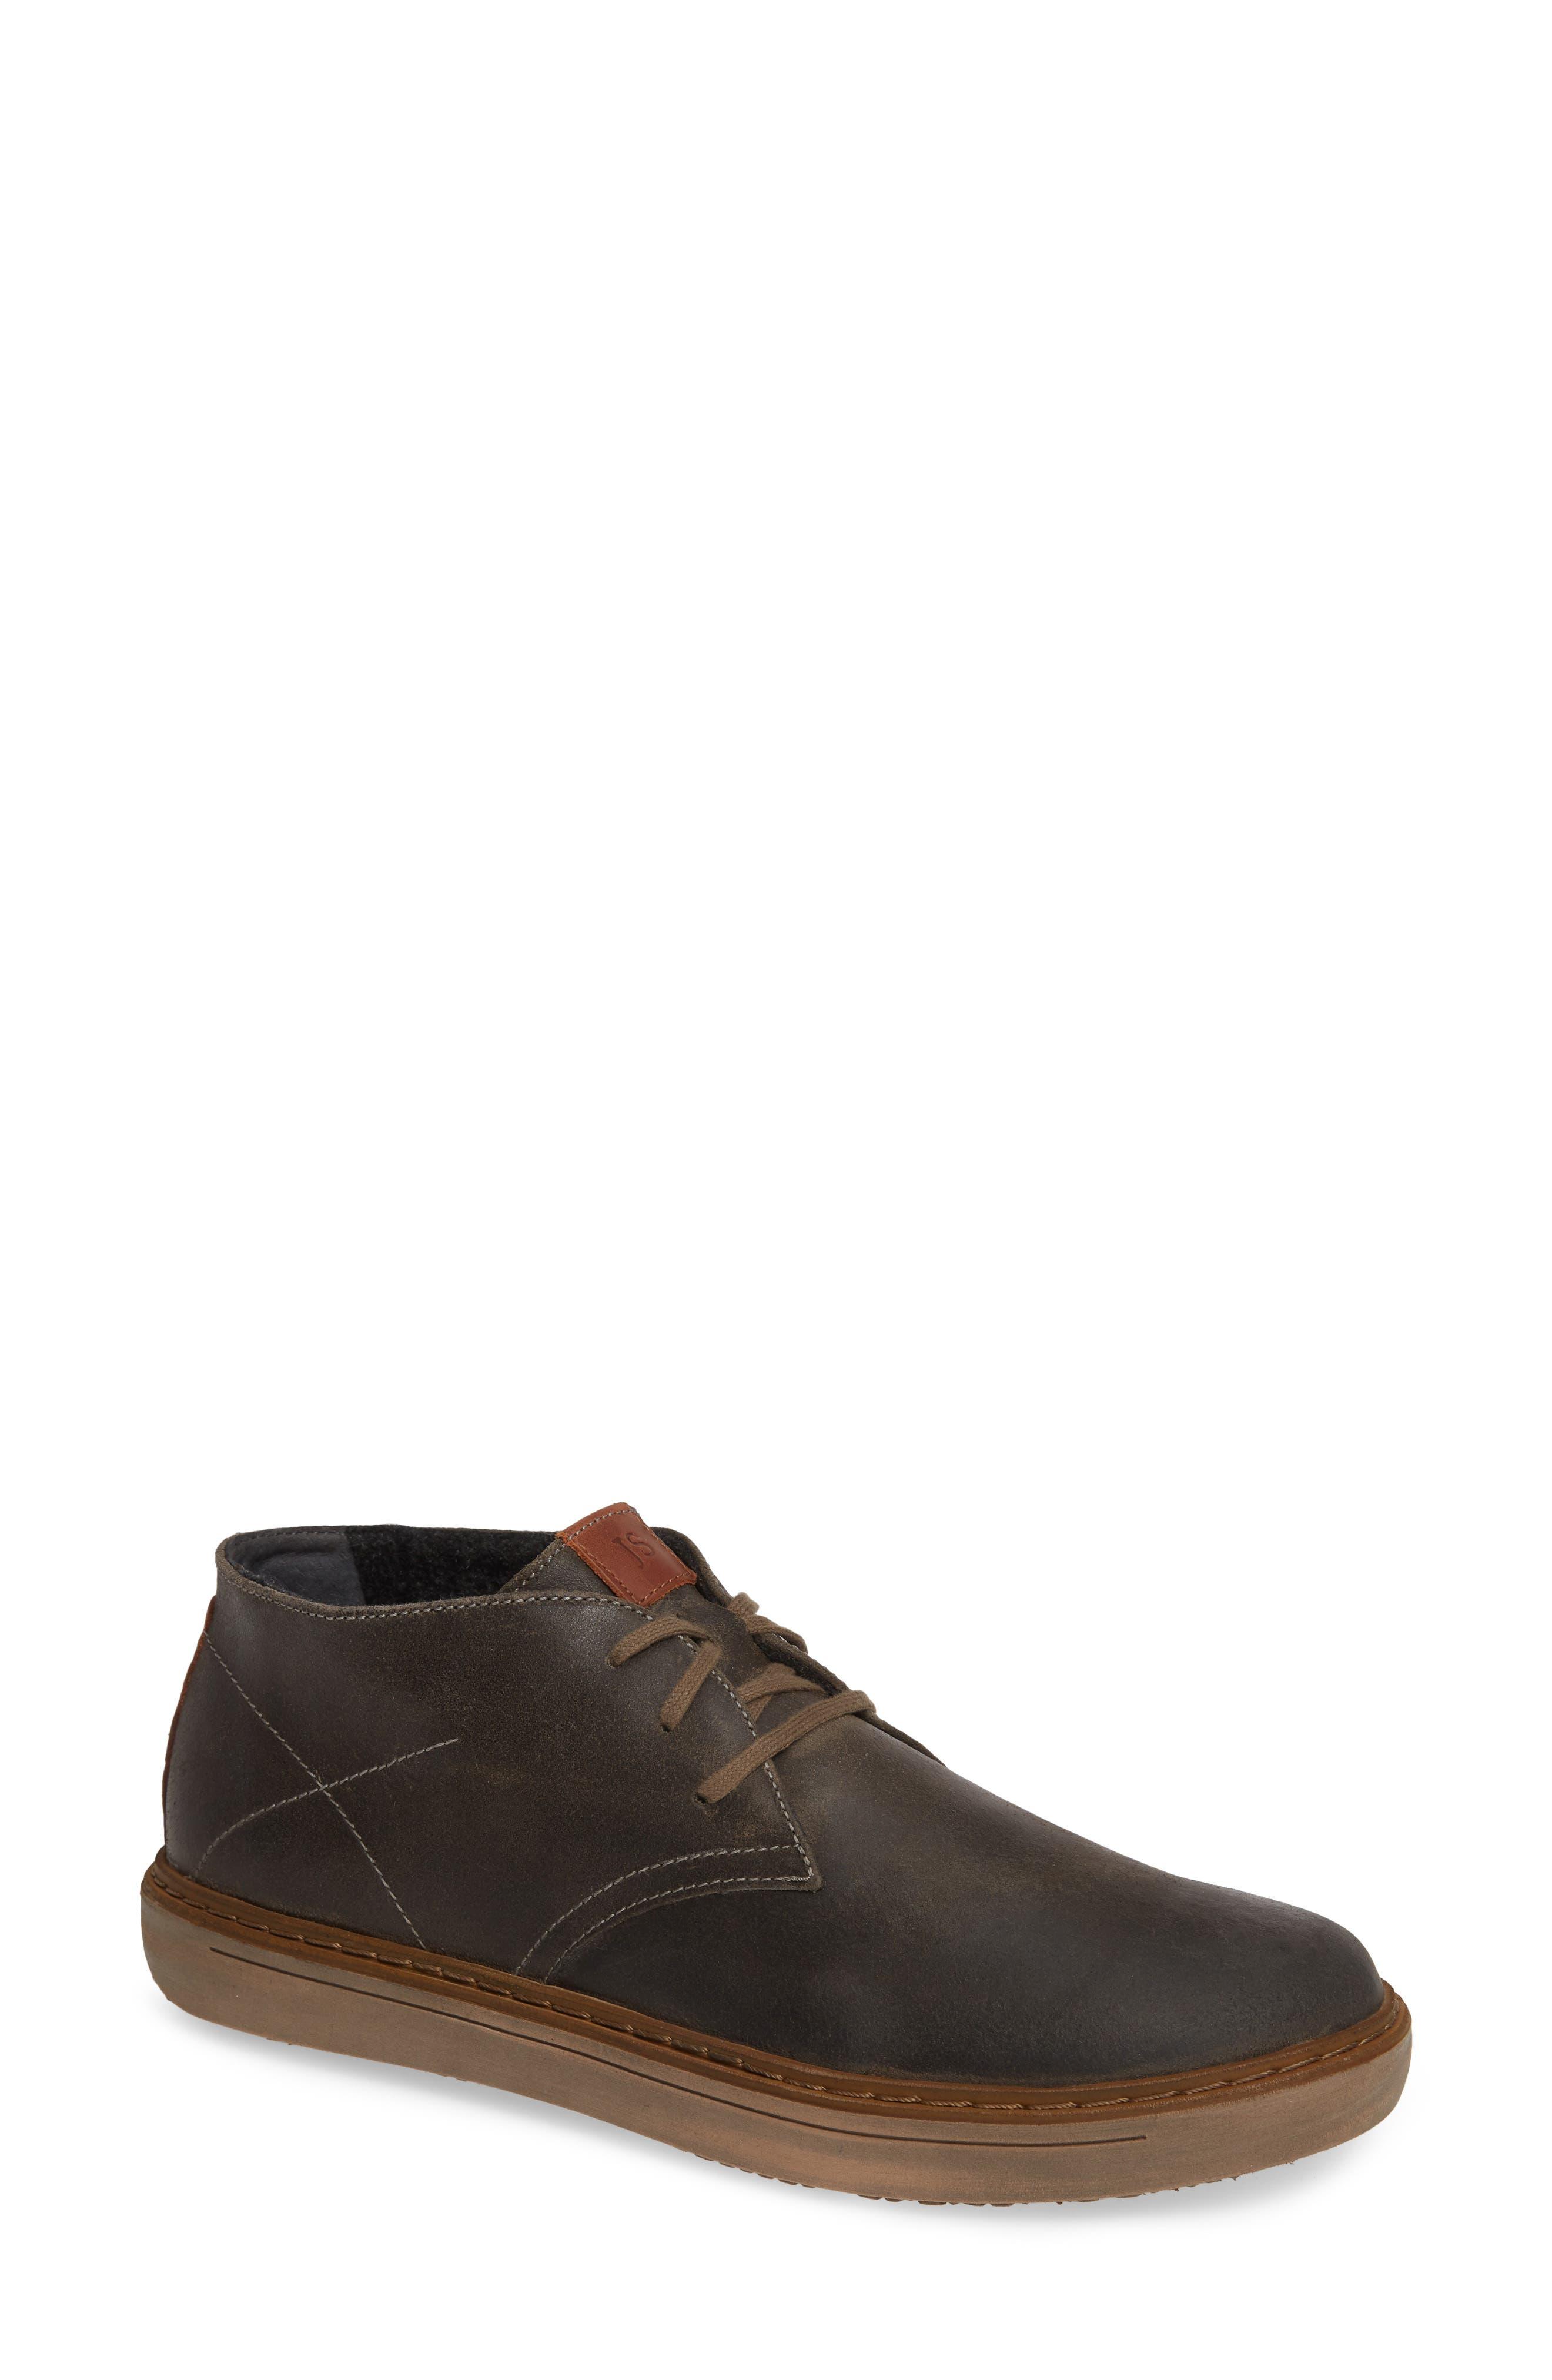 8496ce408bfd Josef Seibel Men s Shoes